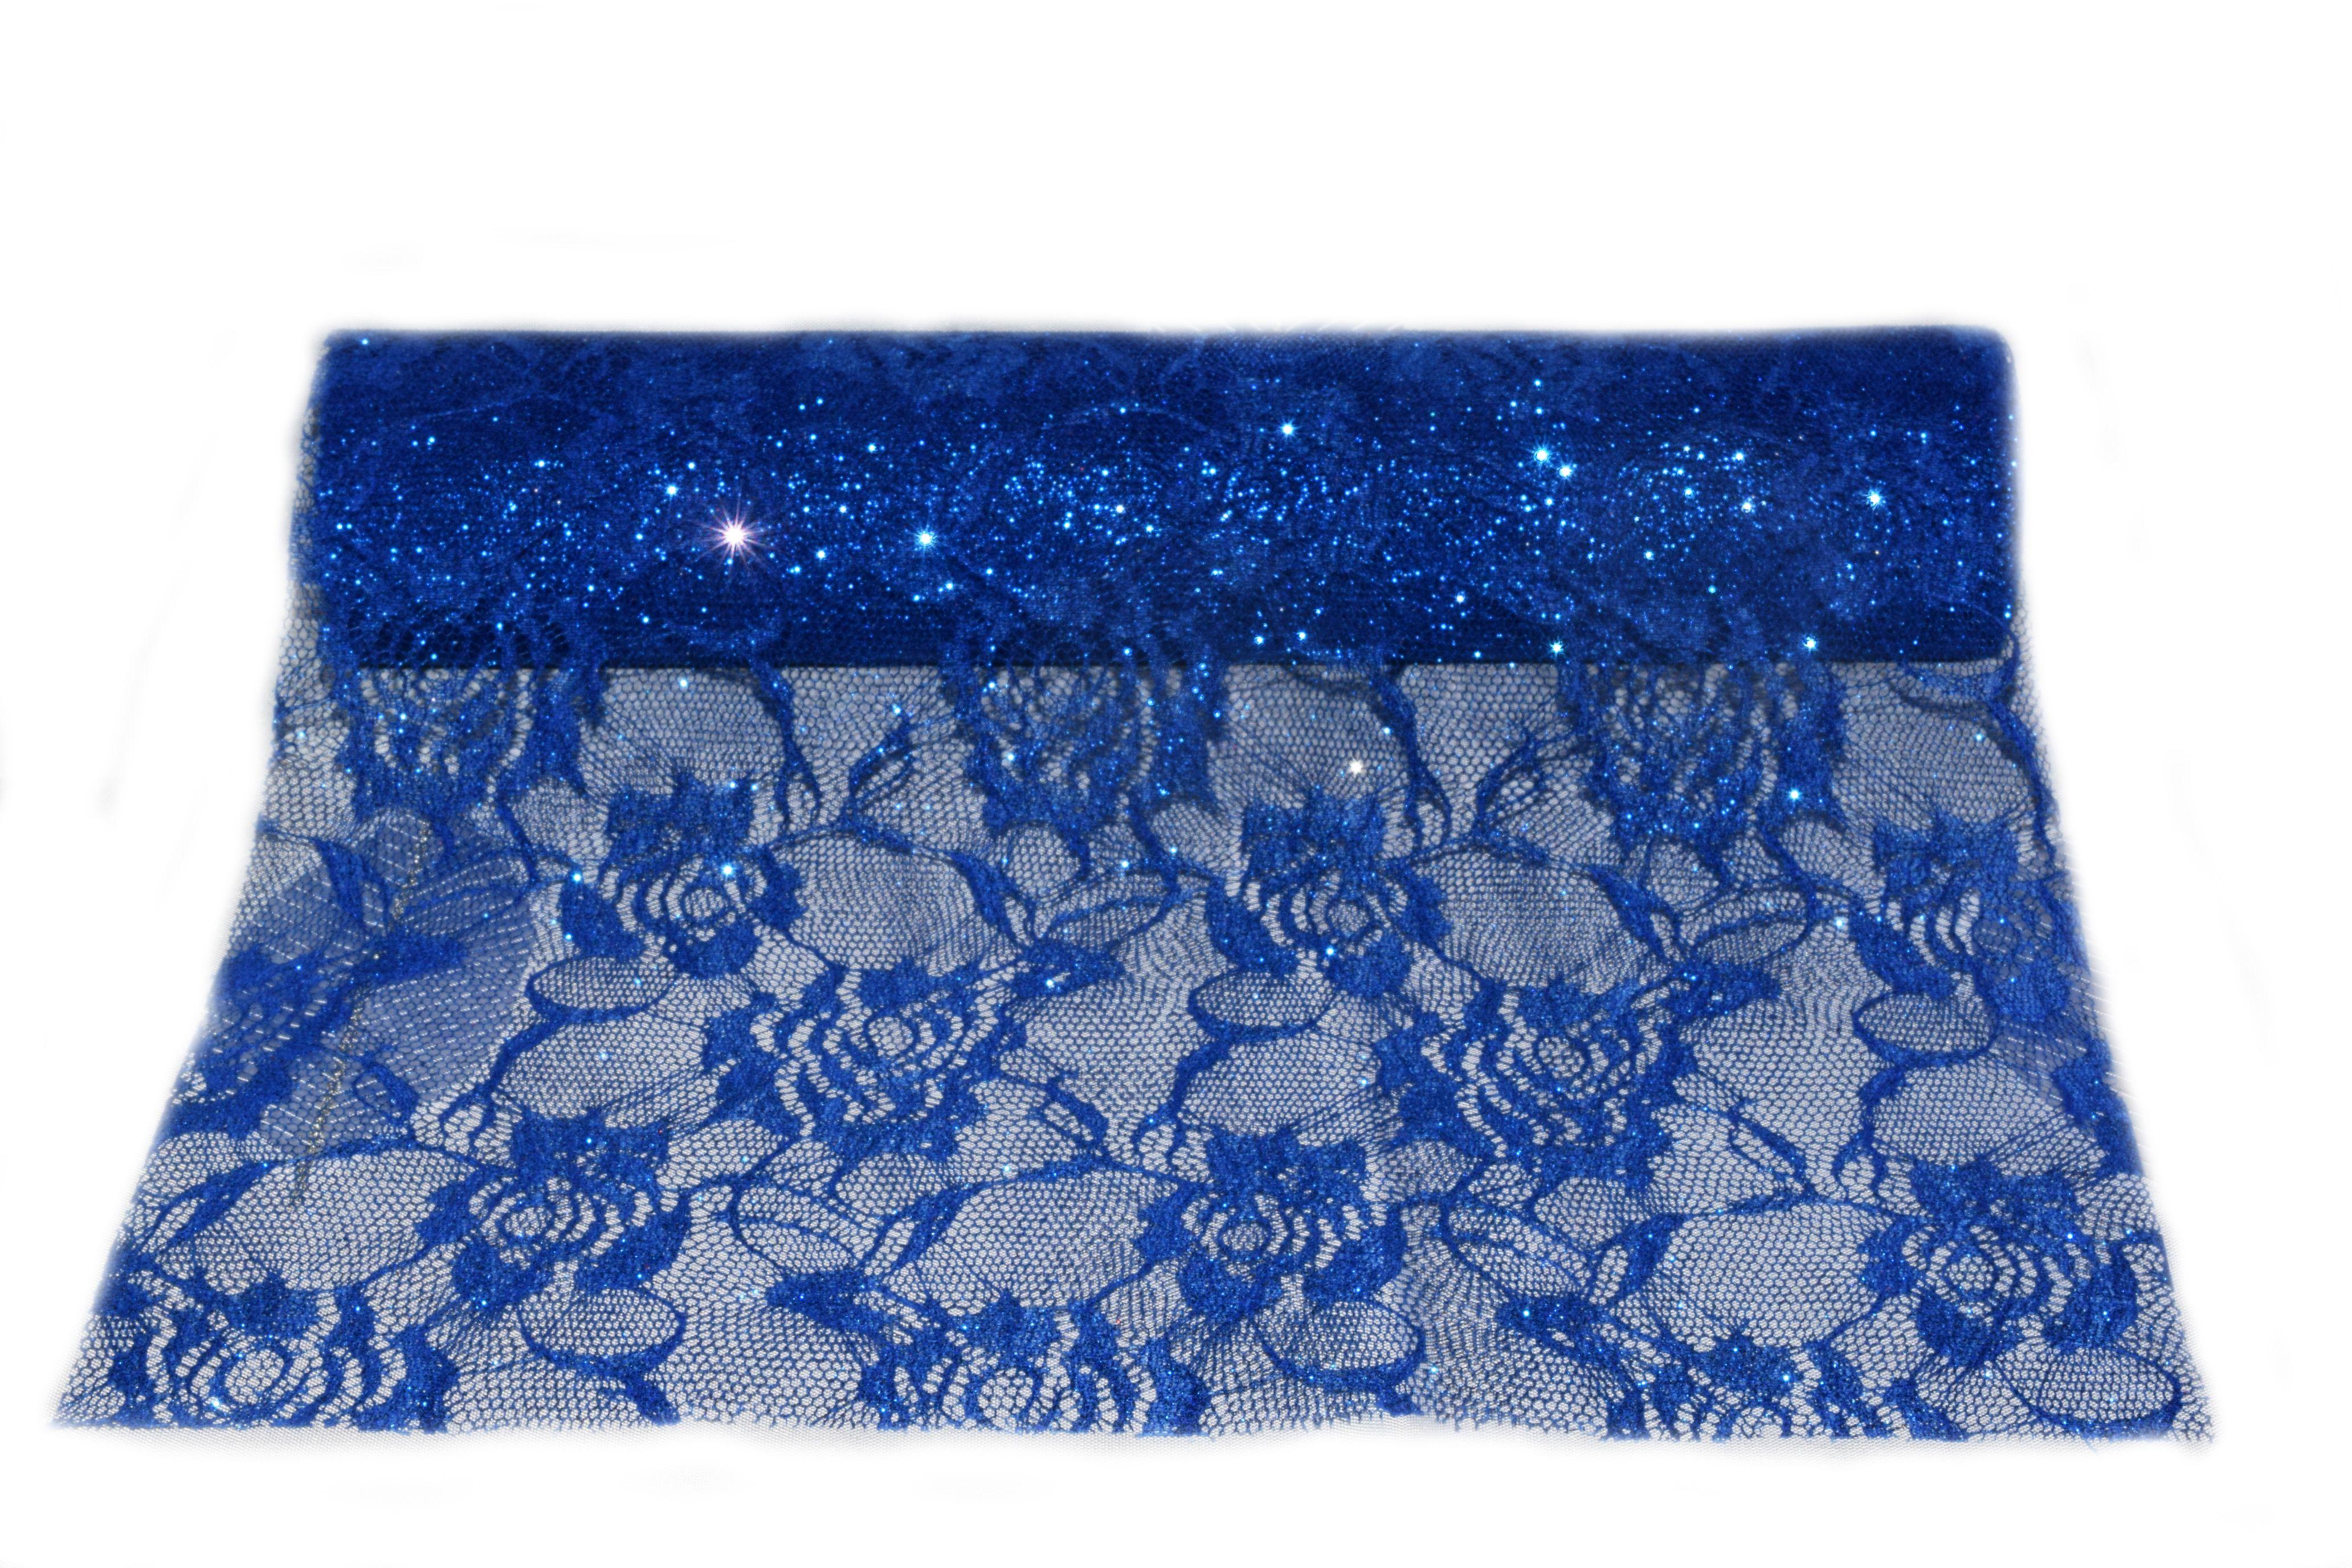 chemin de table bleu pour noel-bijoux feminin